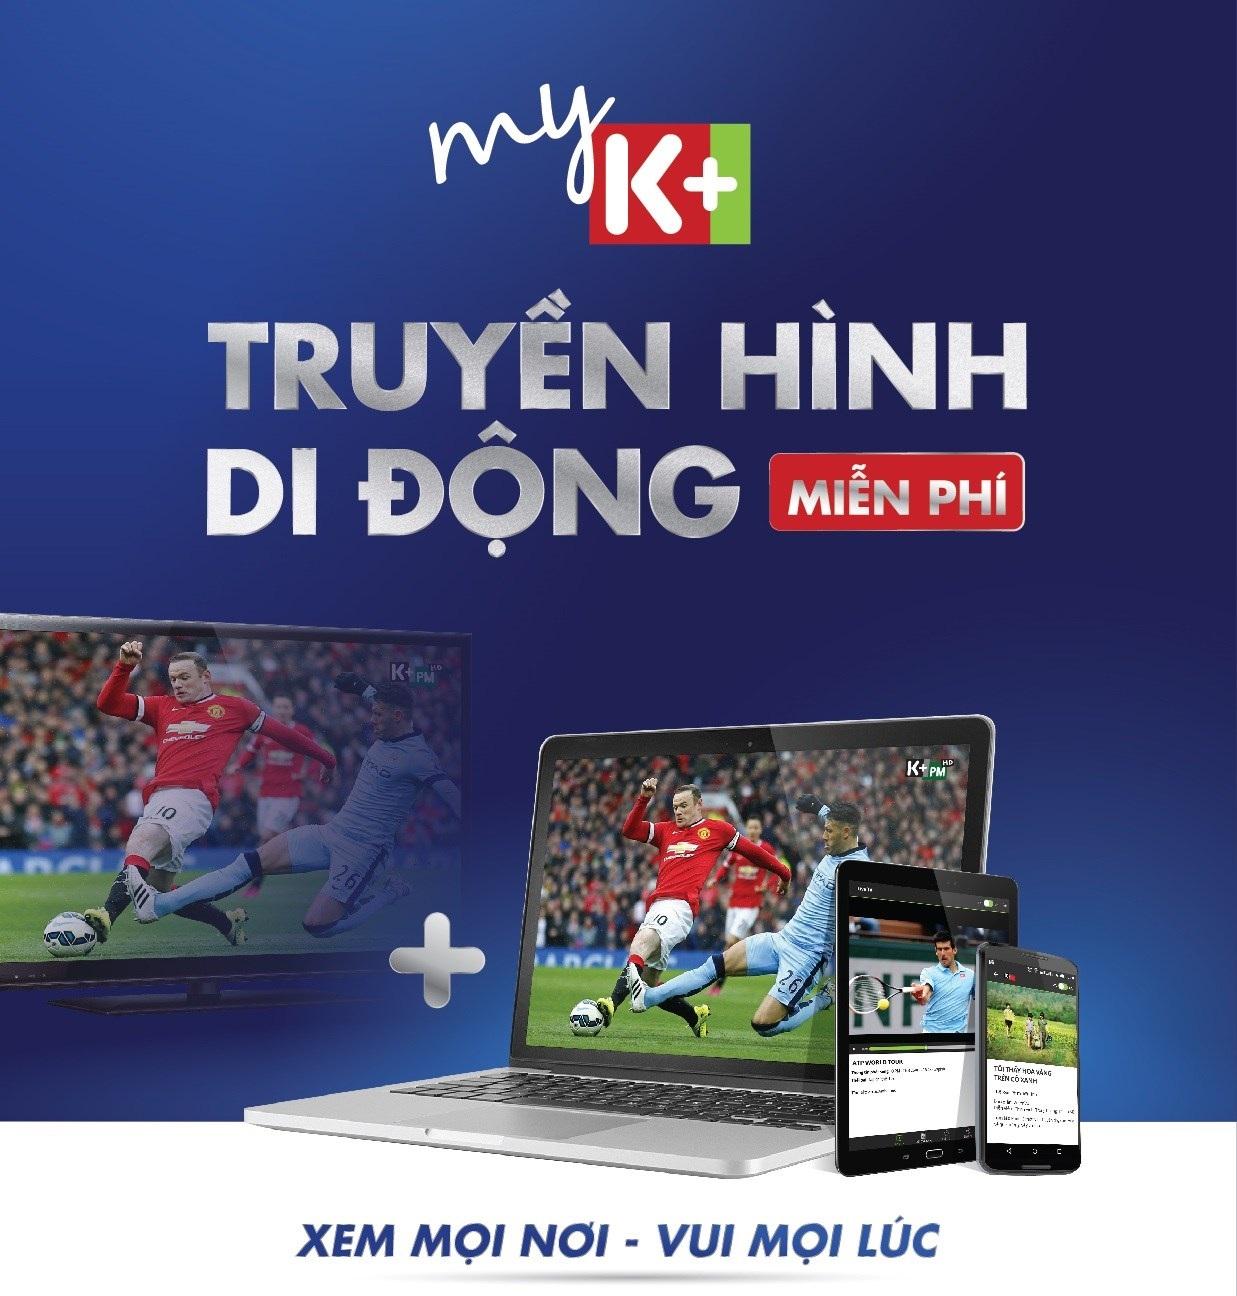 Giới thiệu MyK+